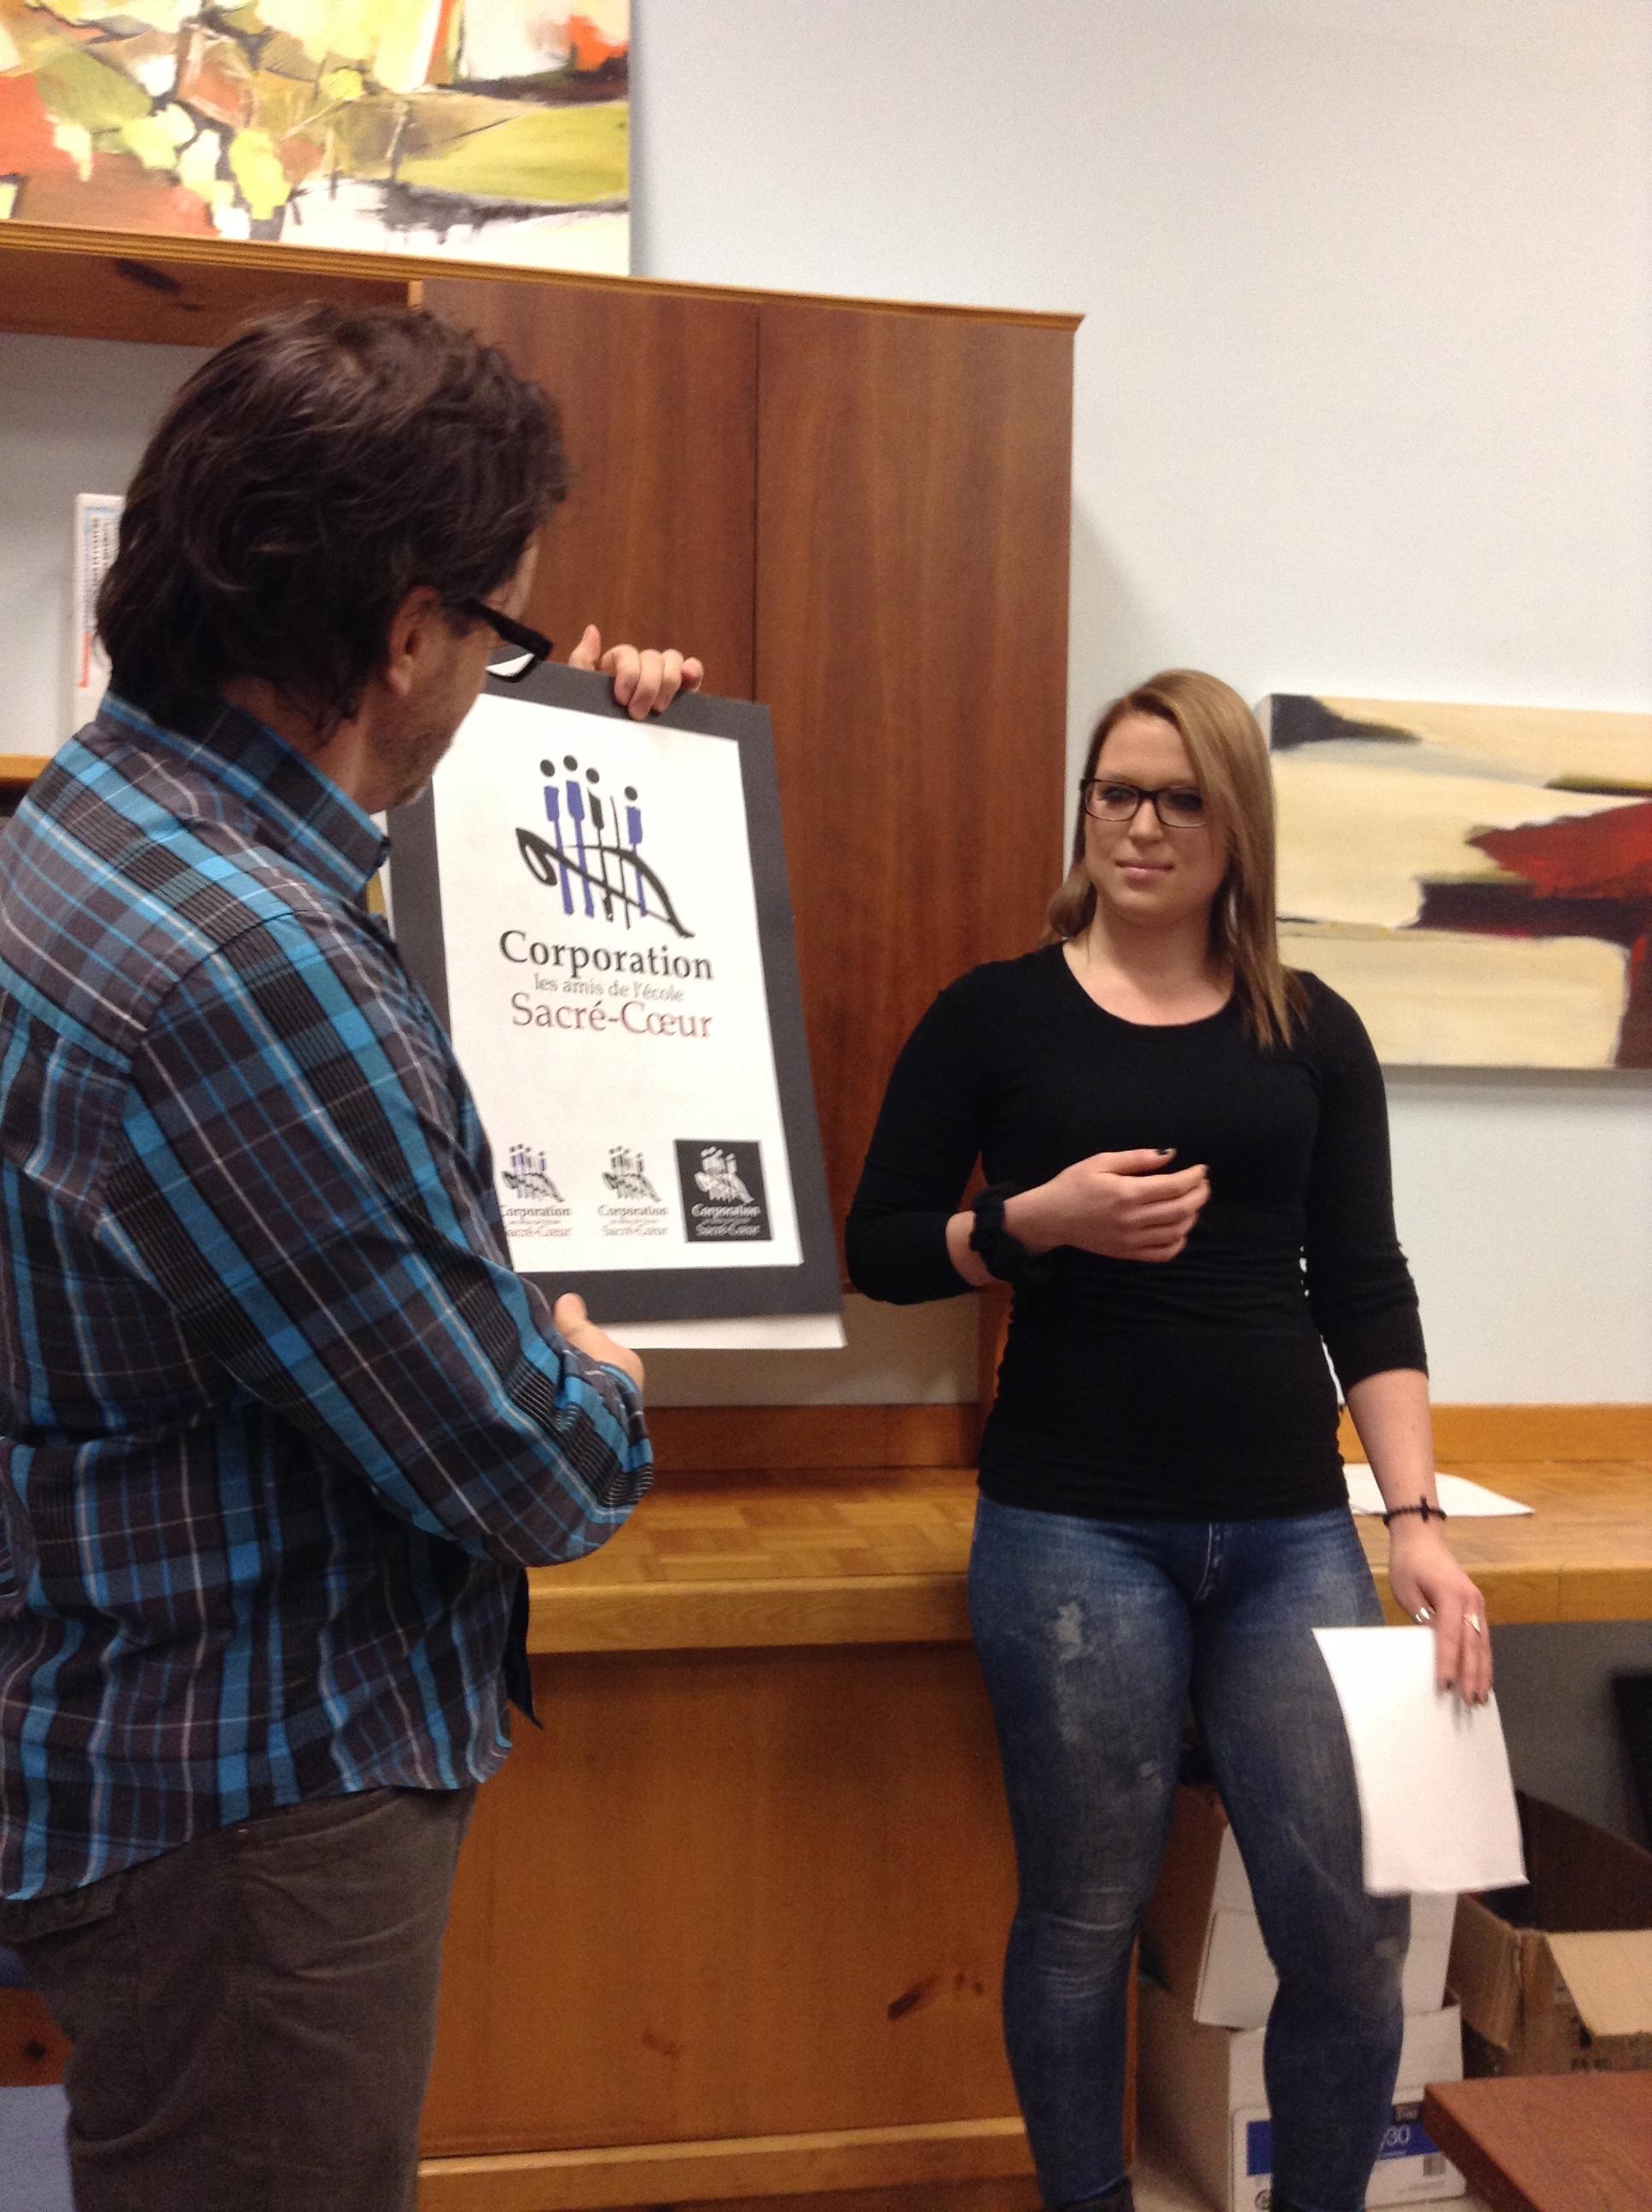 Olivia Perron-Galipeau dévoile le nouveau logo de la Corporation.